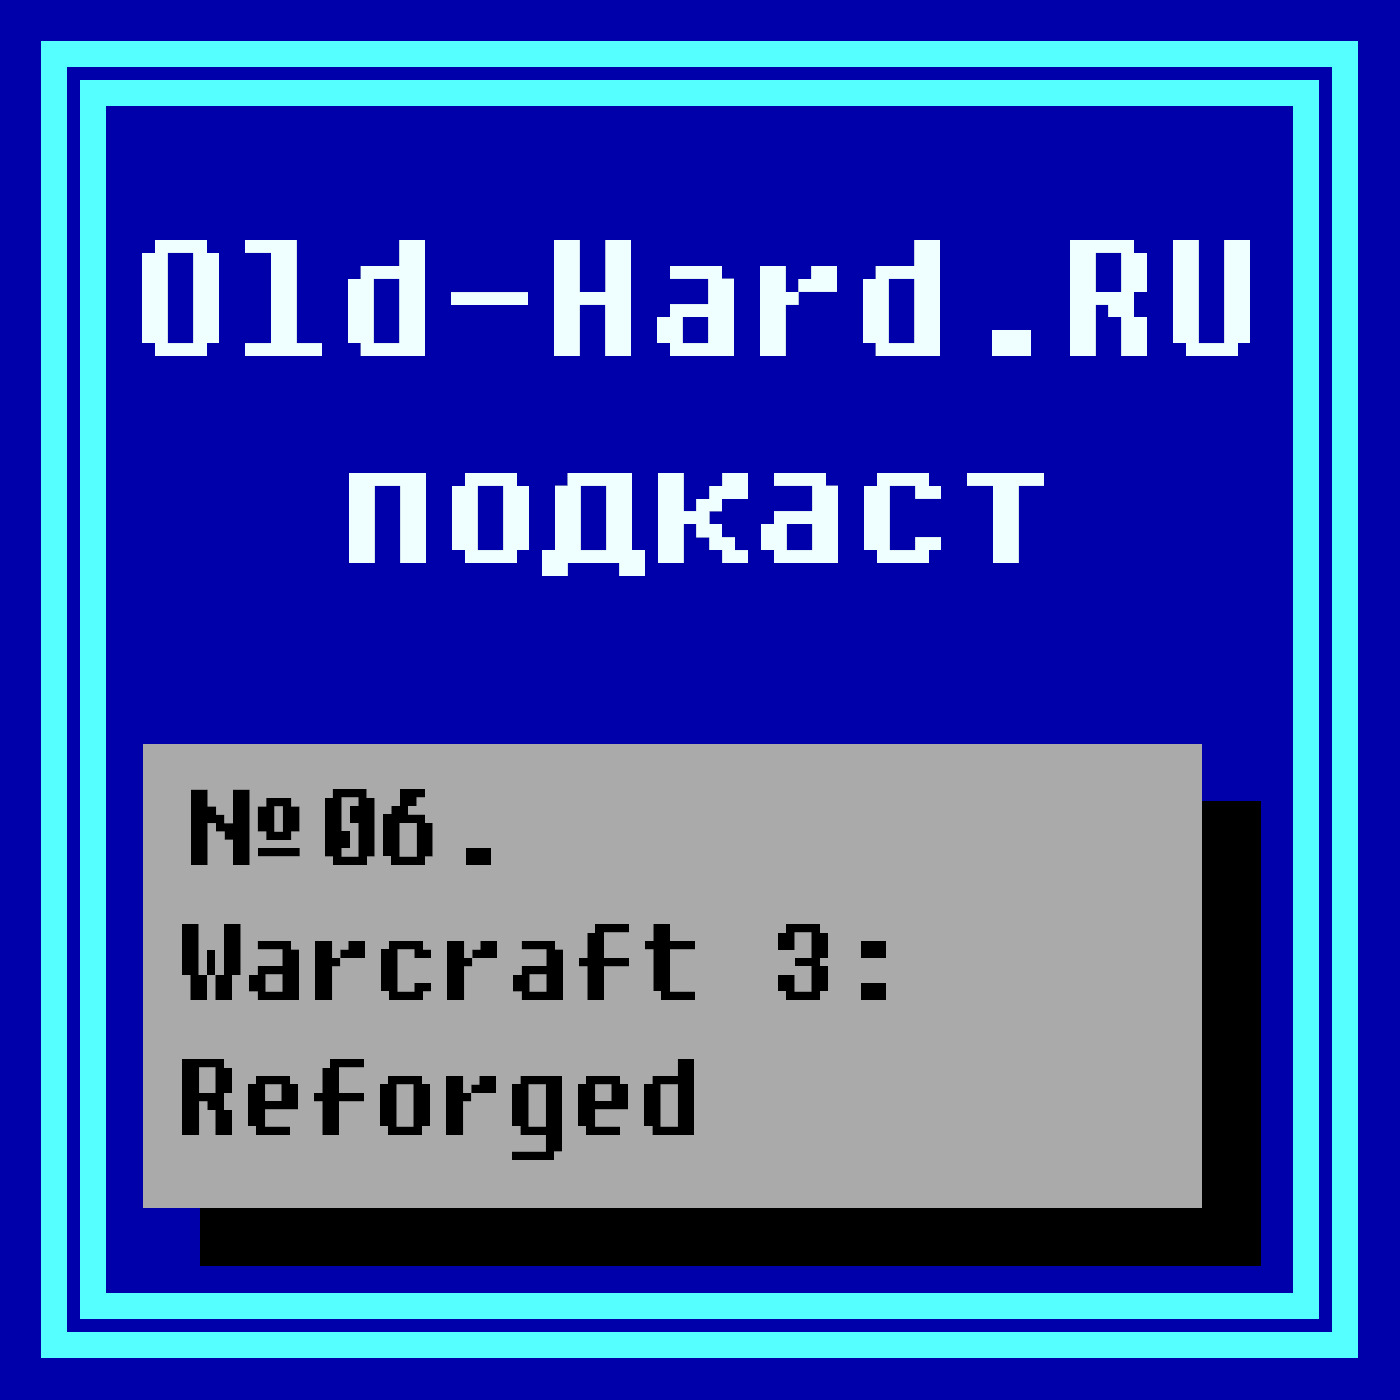 Оценка Wacraft 3: Reforged на metacritic